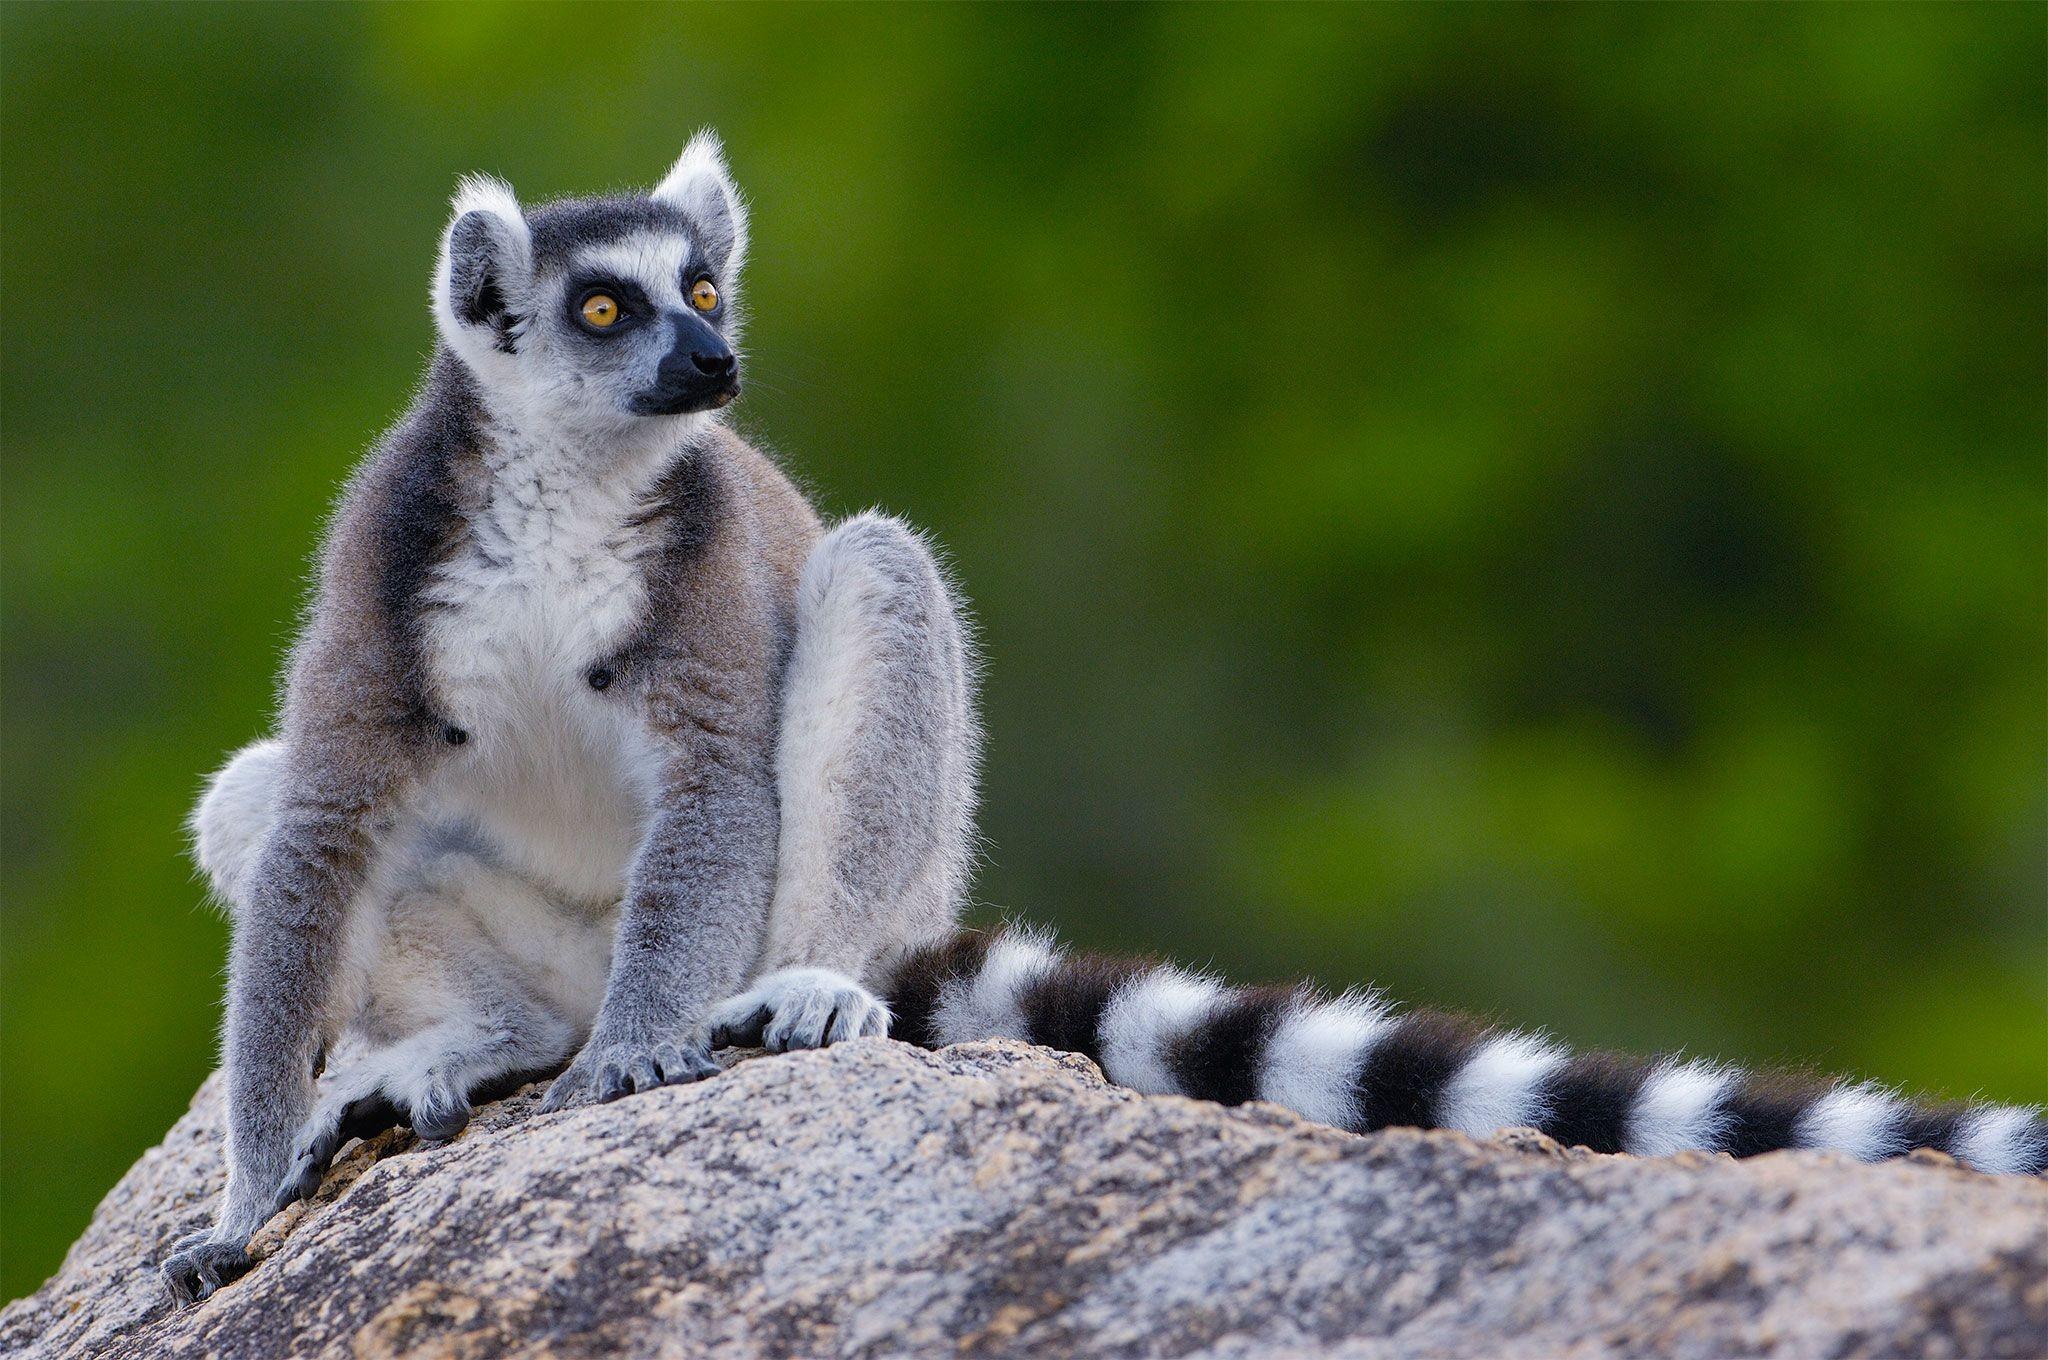 Res: 2048x1360, Lemur wallpapers, Animal, HQ Lemur pictures | 4K Wallpapers